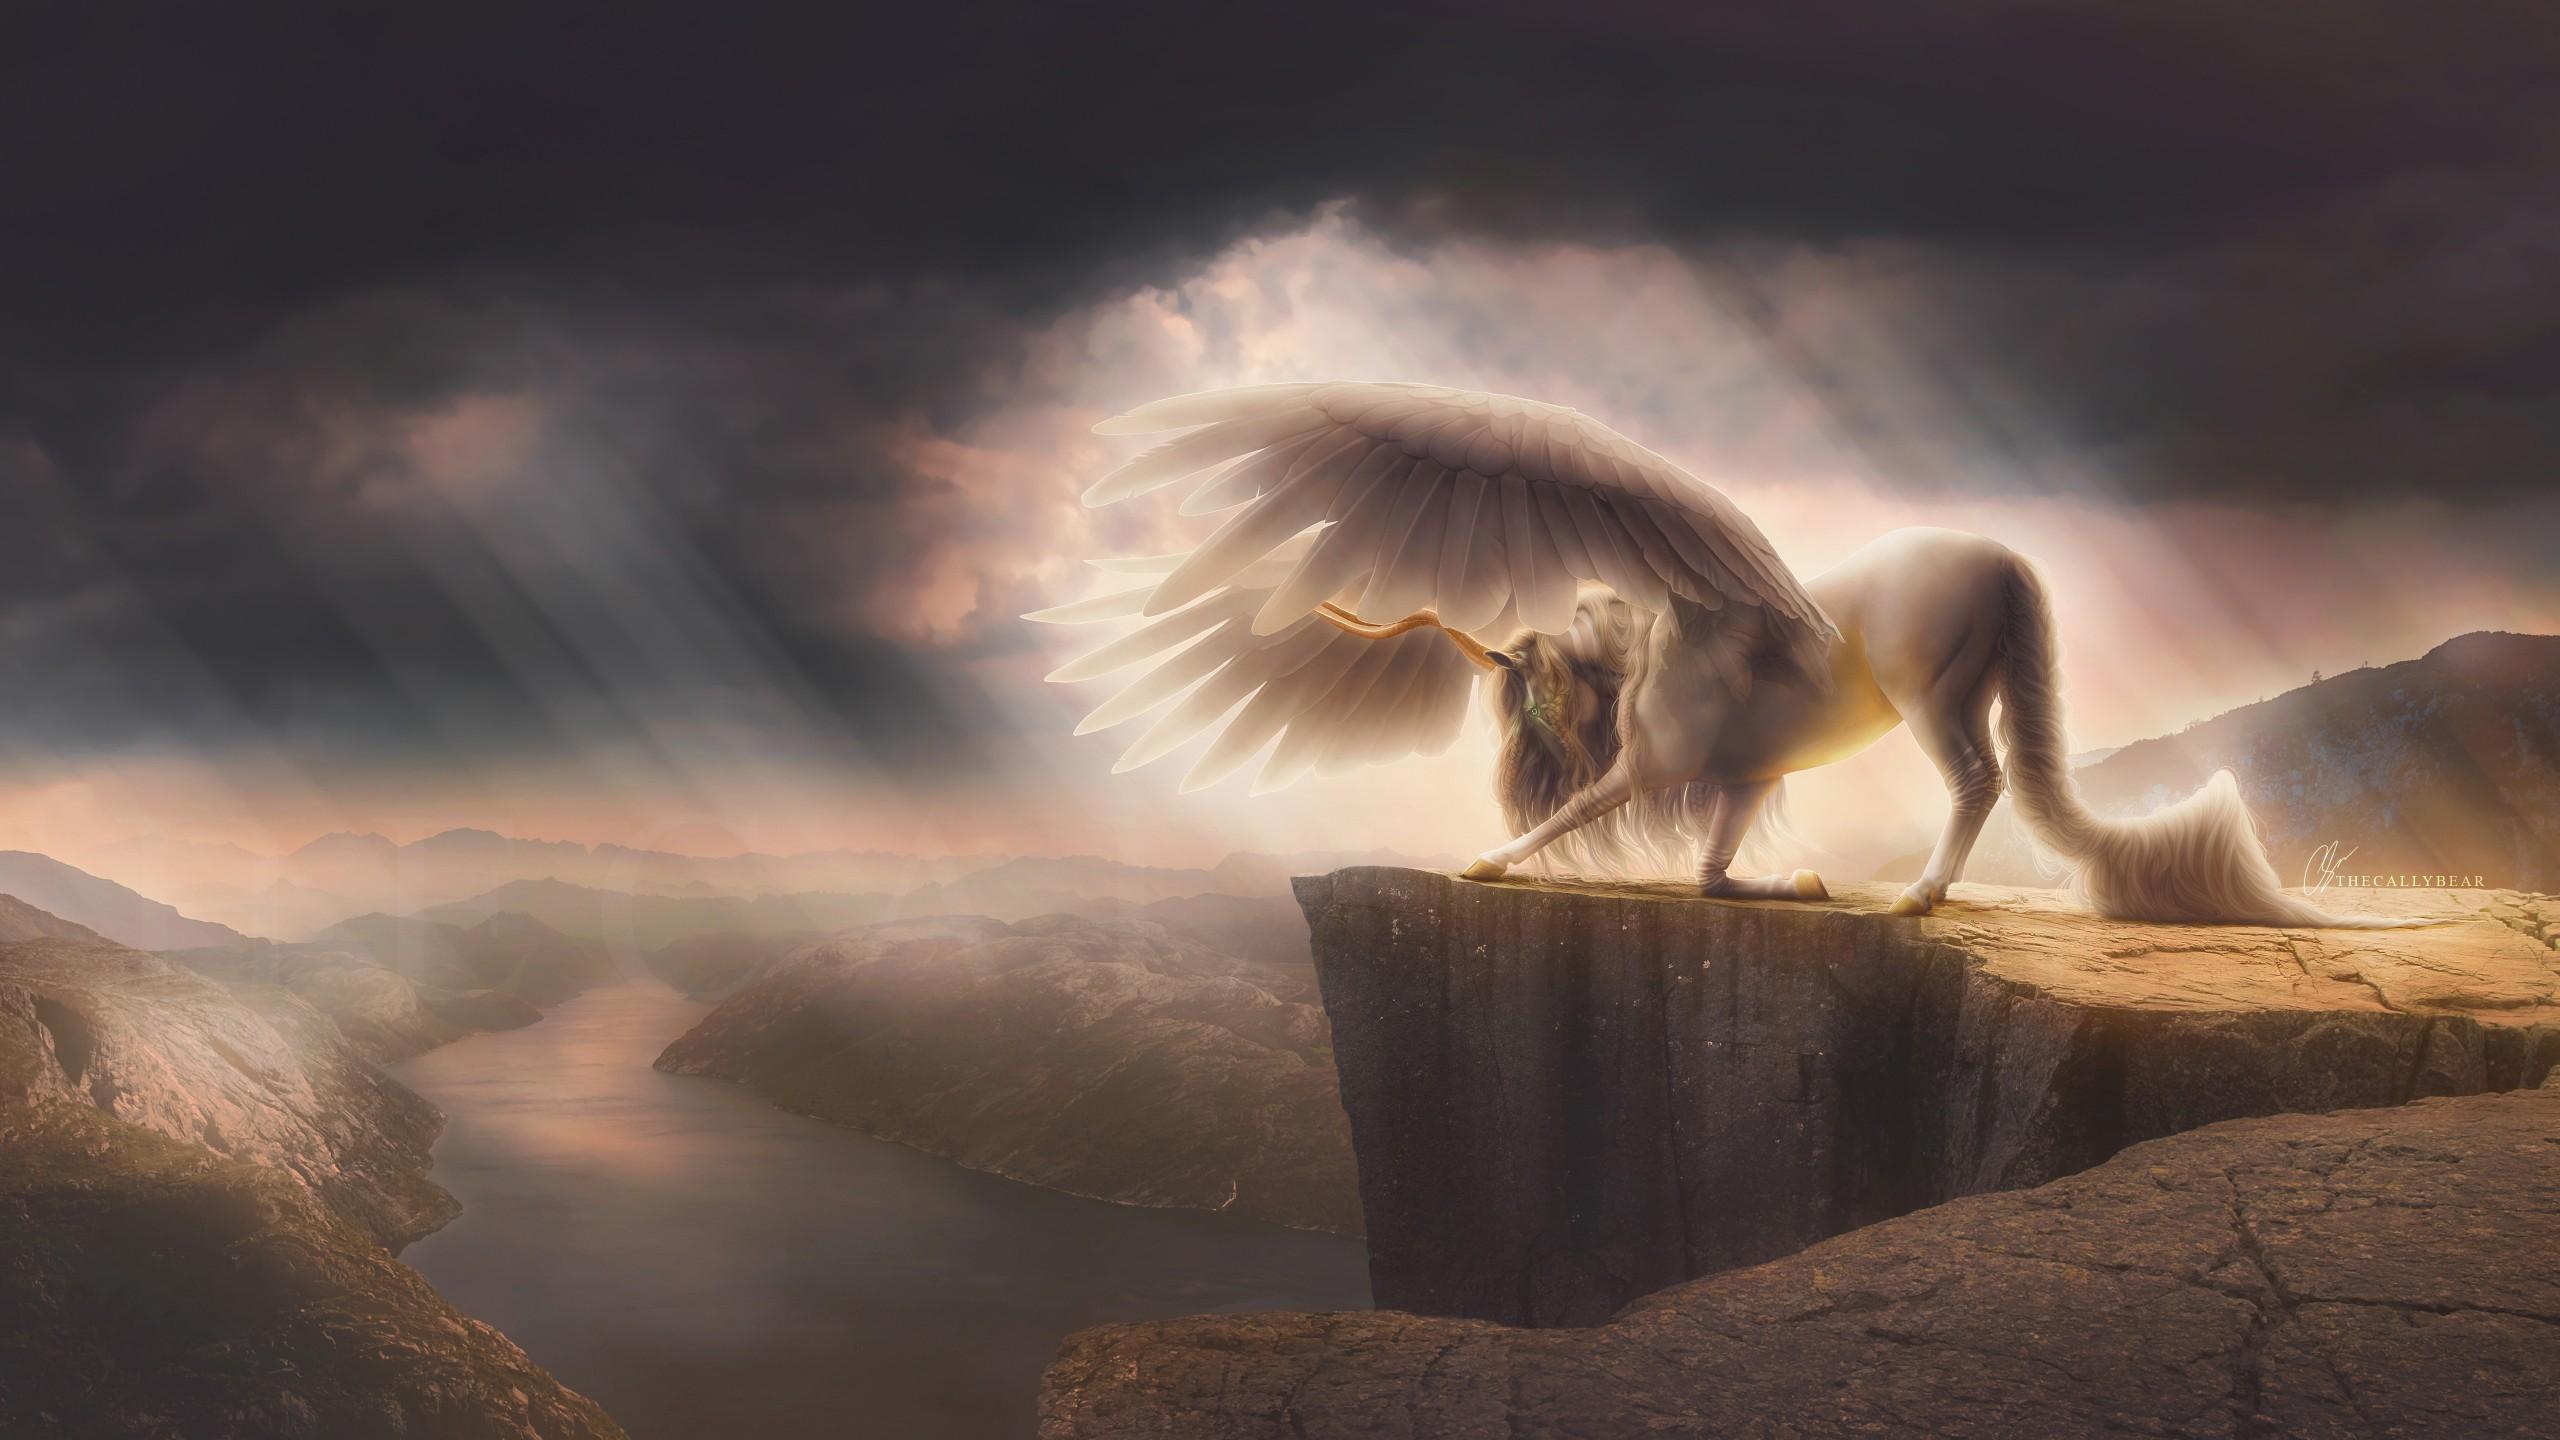 3d Wallpaper Hd 1080p Download Fantasy Pegasus Horse 4k Wallpapers Hd Wallpapers Id